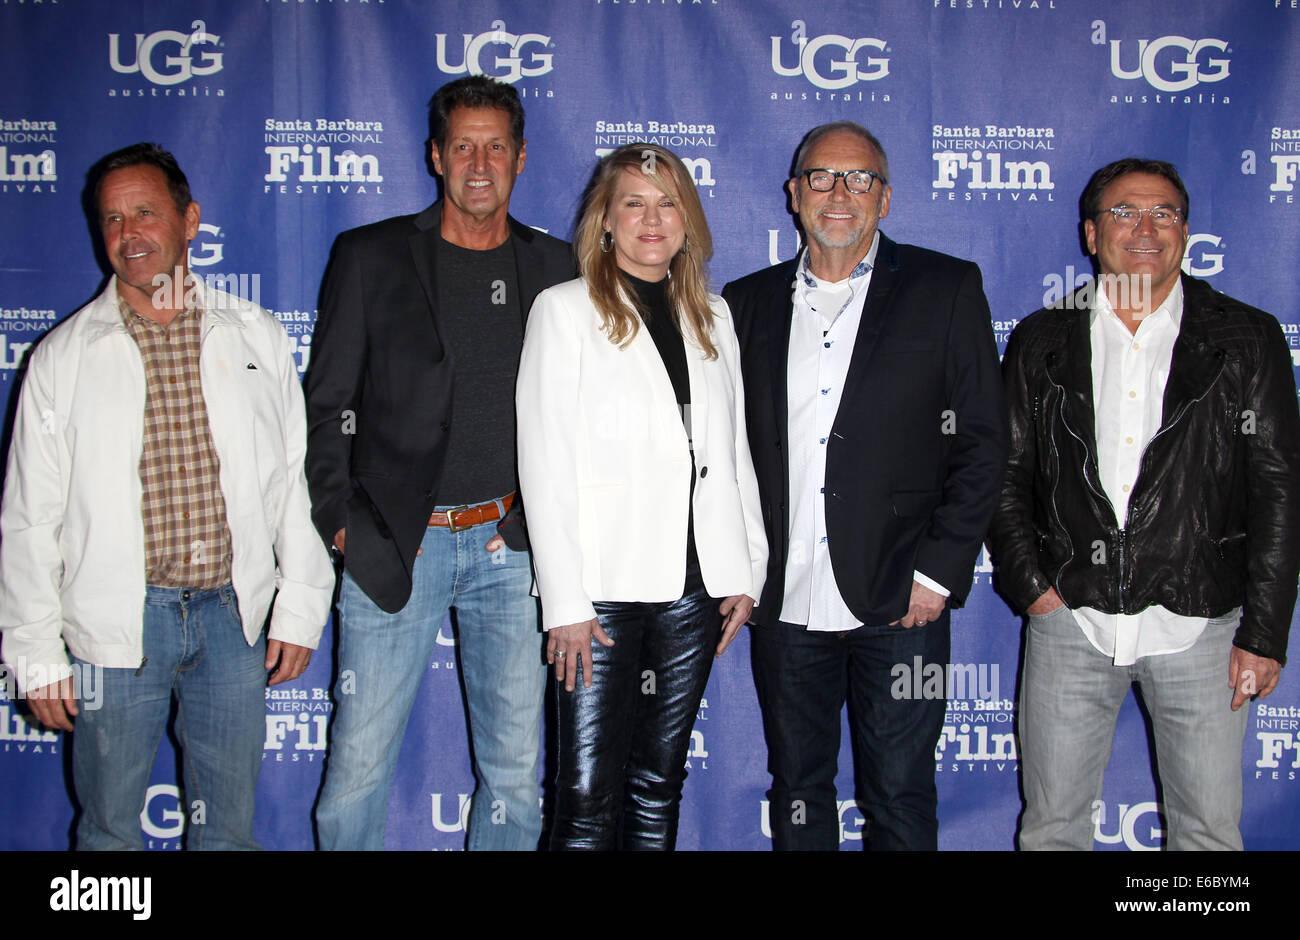 29th Santa Barbara International Film Festival 'Oustanding Performer of the Year' award in honour of Cate - Stock Image